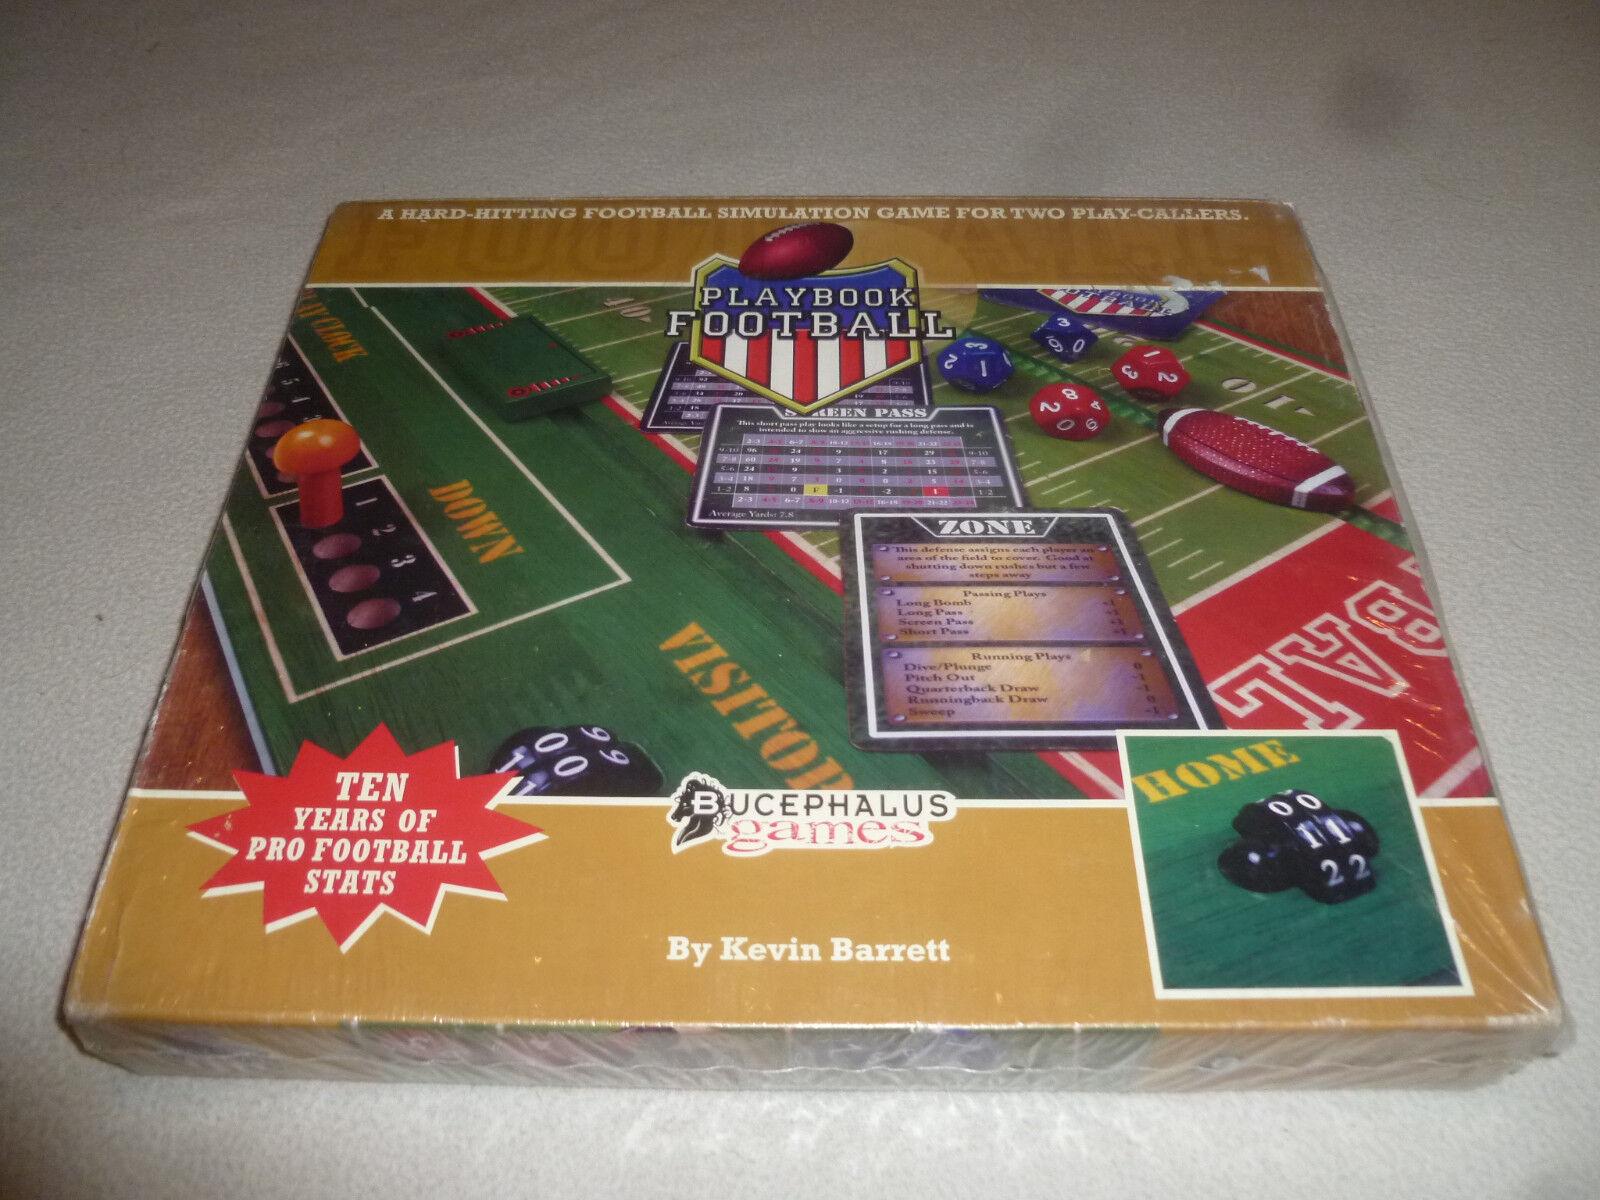 Neue playbook - brettspiel bucephalus spiele 2008 kevin barrett - simulation